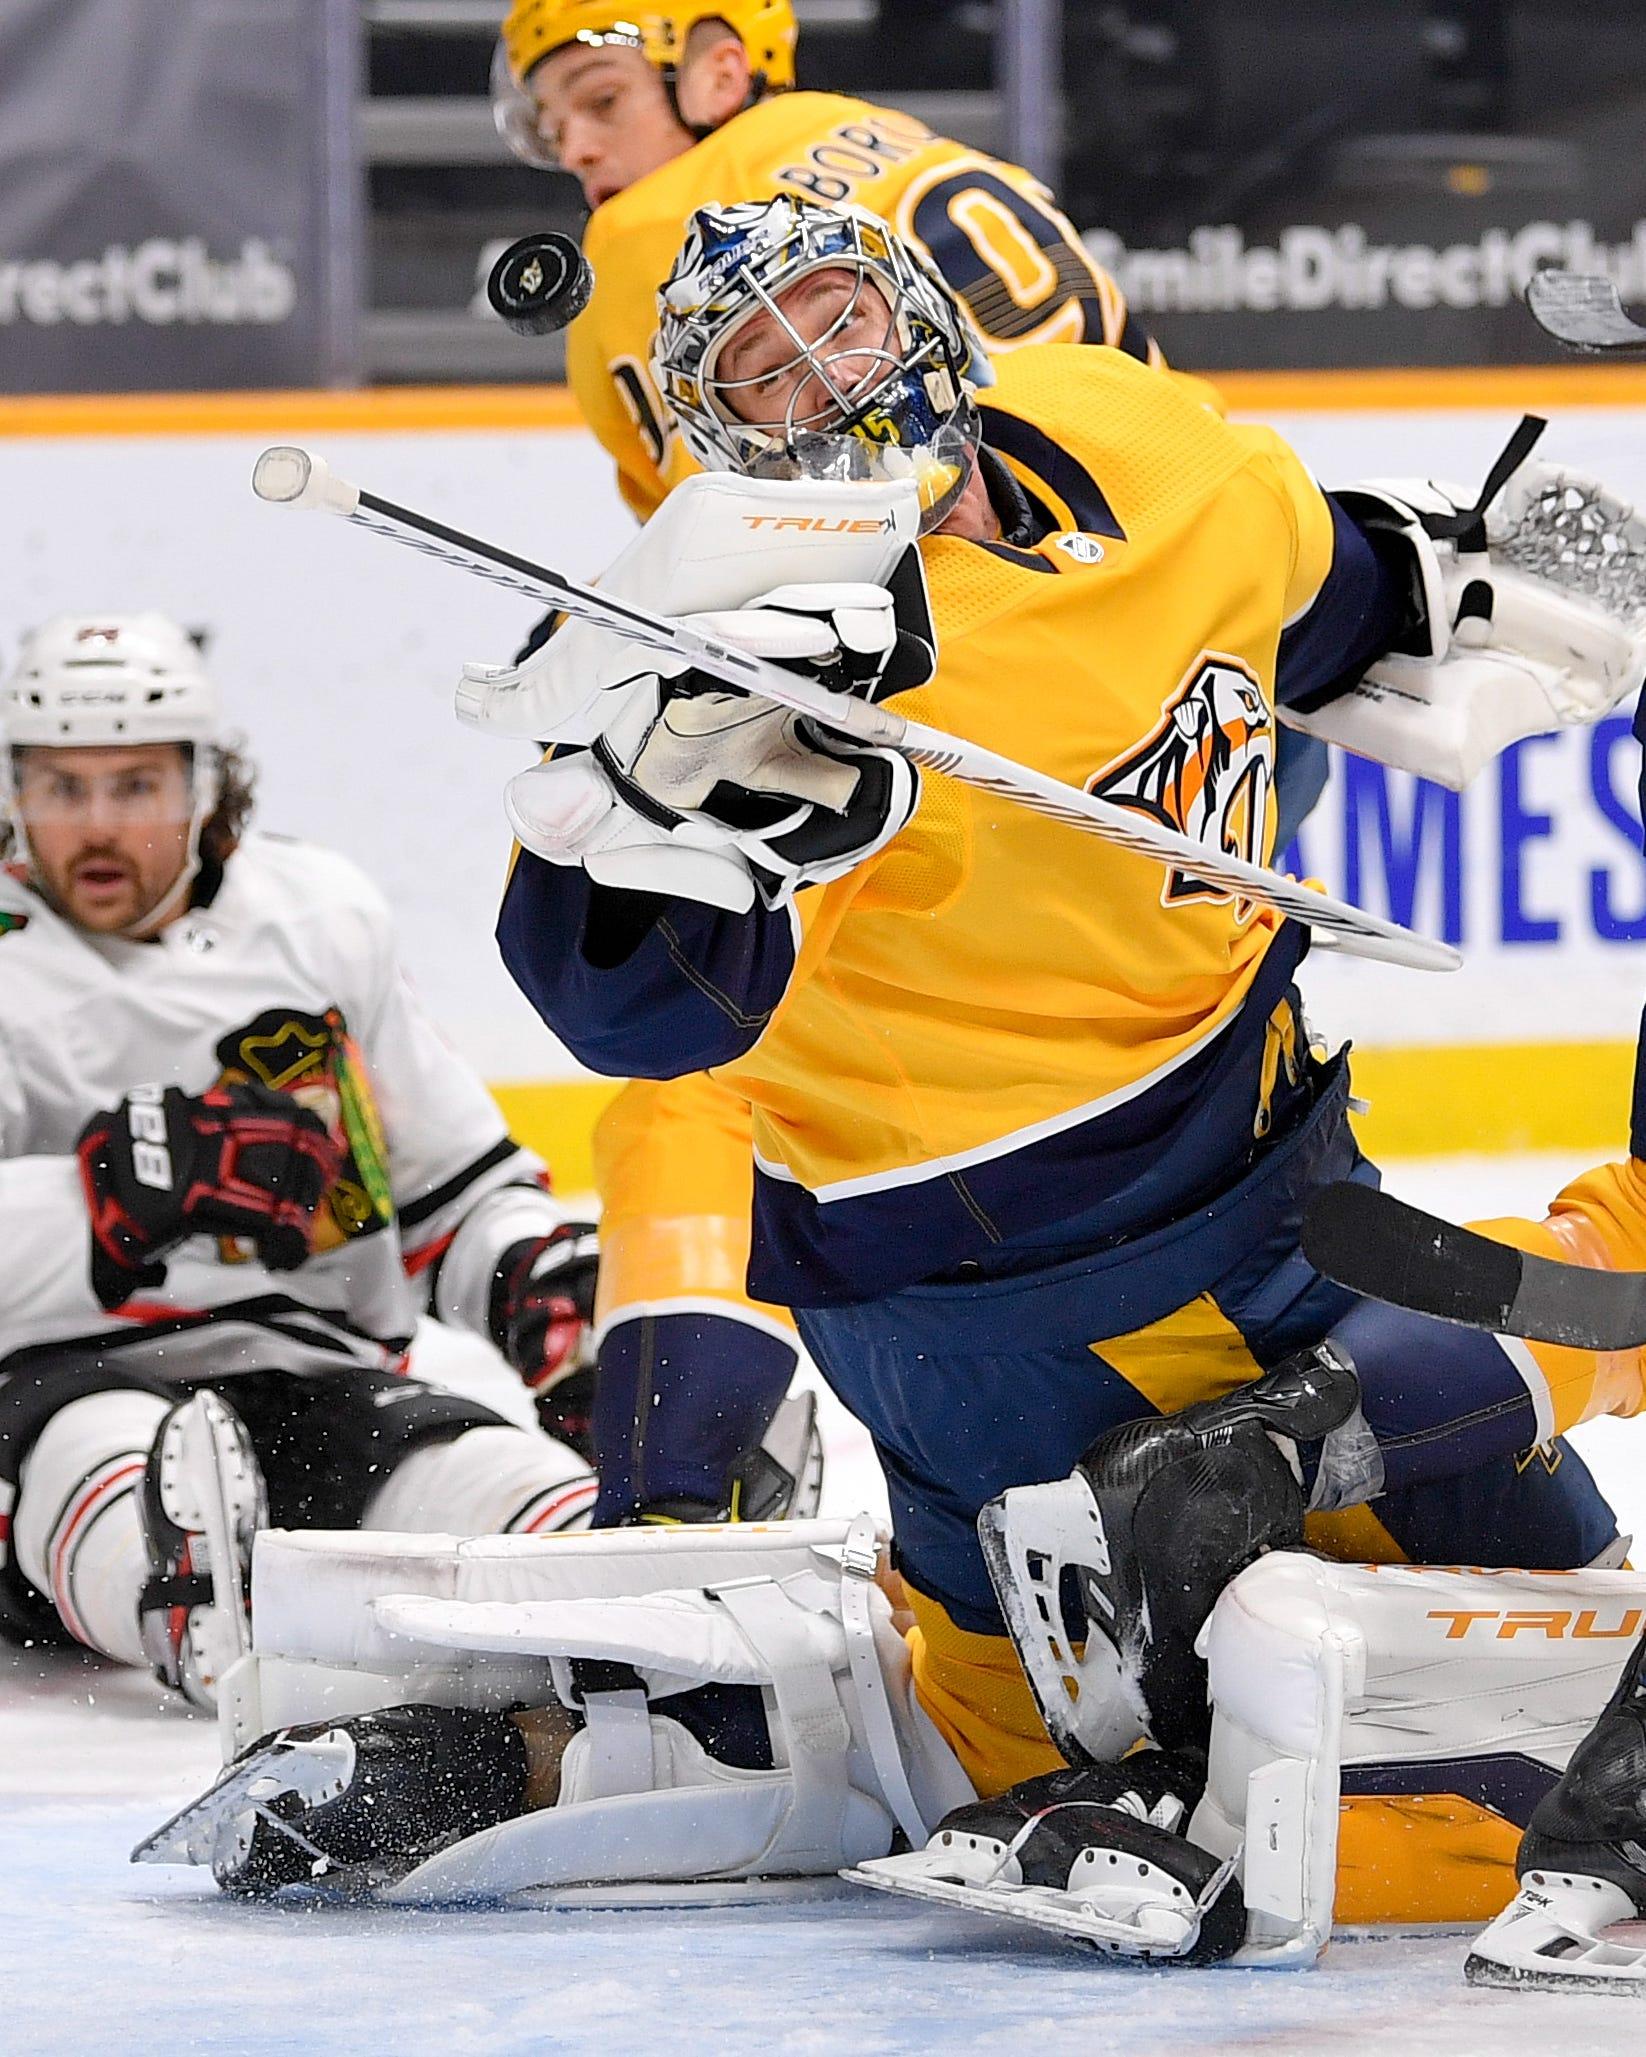 Nashville Predators goalie Pekka Rinne talks trade rumors, struggles